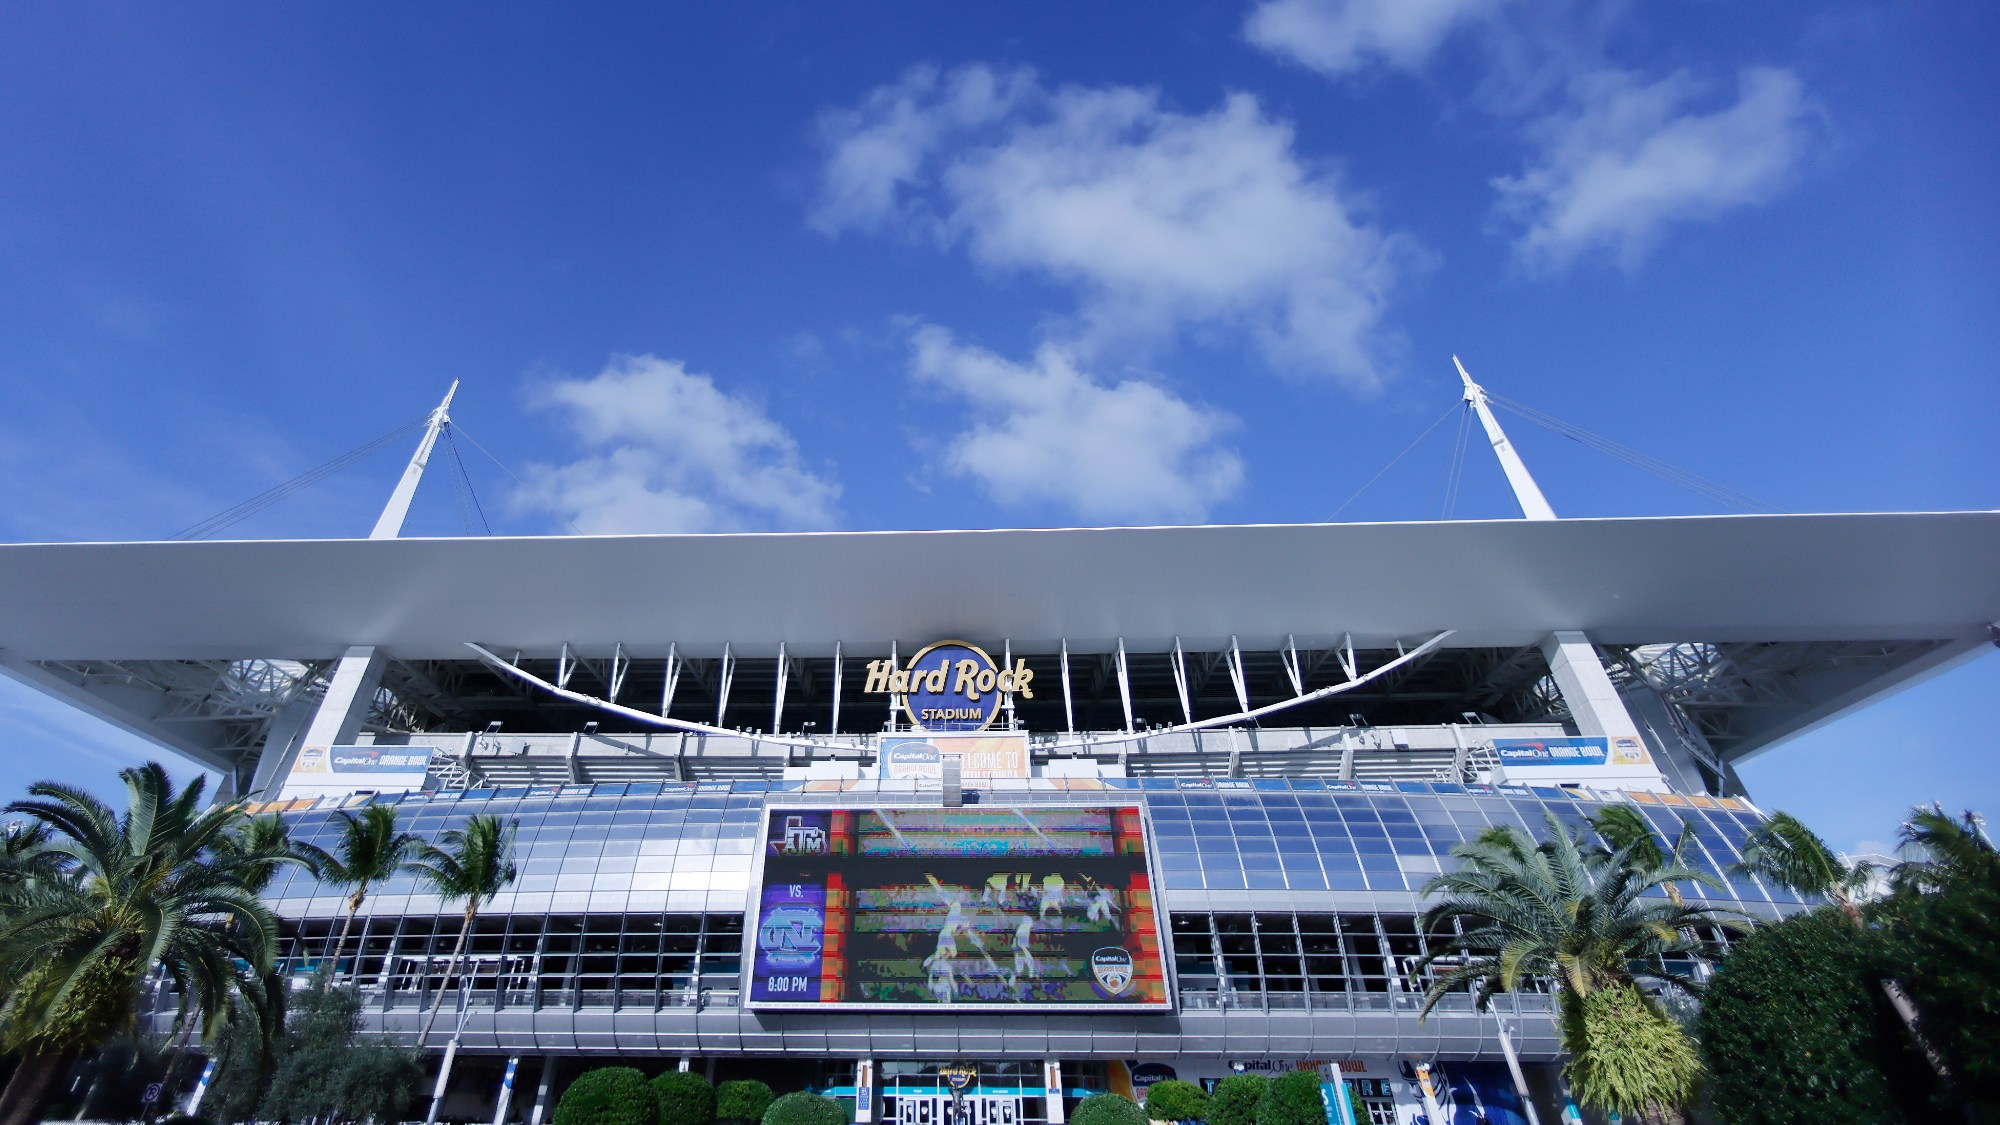 Miami, Hard Rock Stadium F1 2022